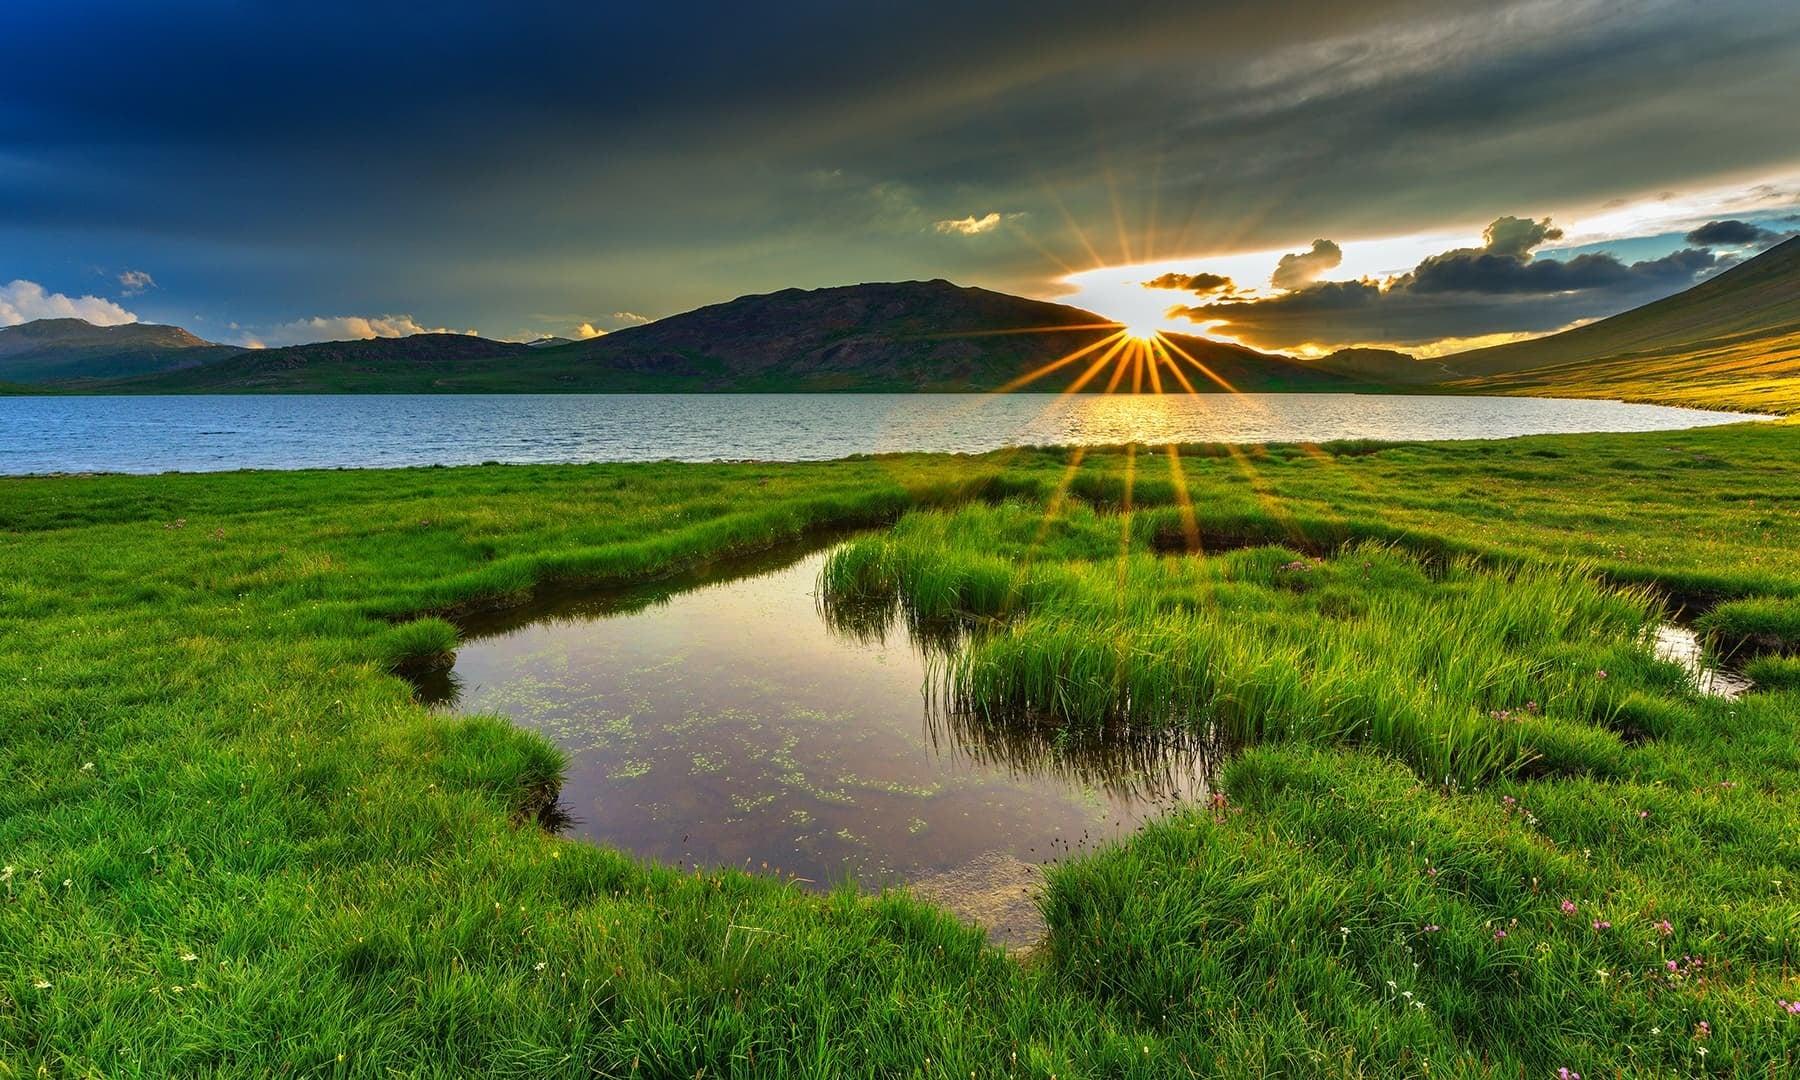 Sunset at Sheosar Lake. — Photo by Syed Mehdi Bukhari